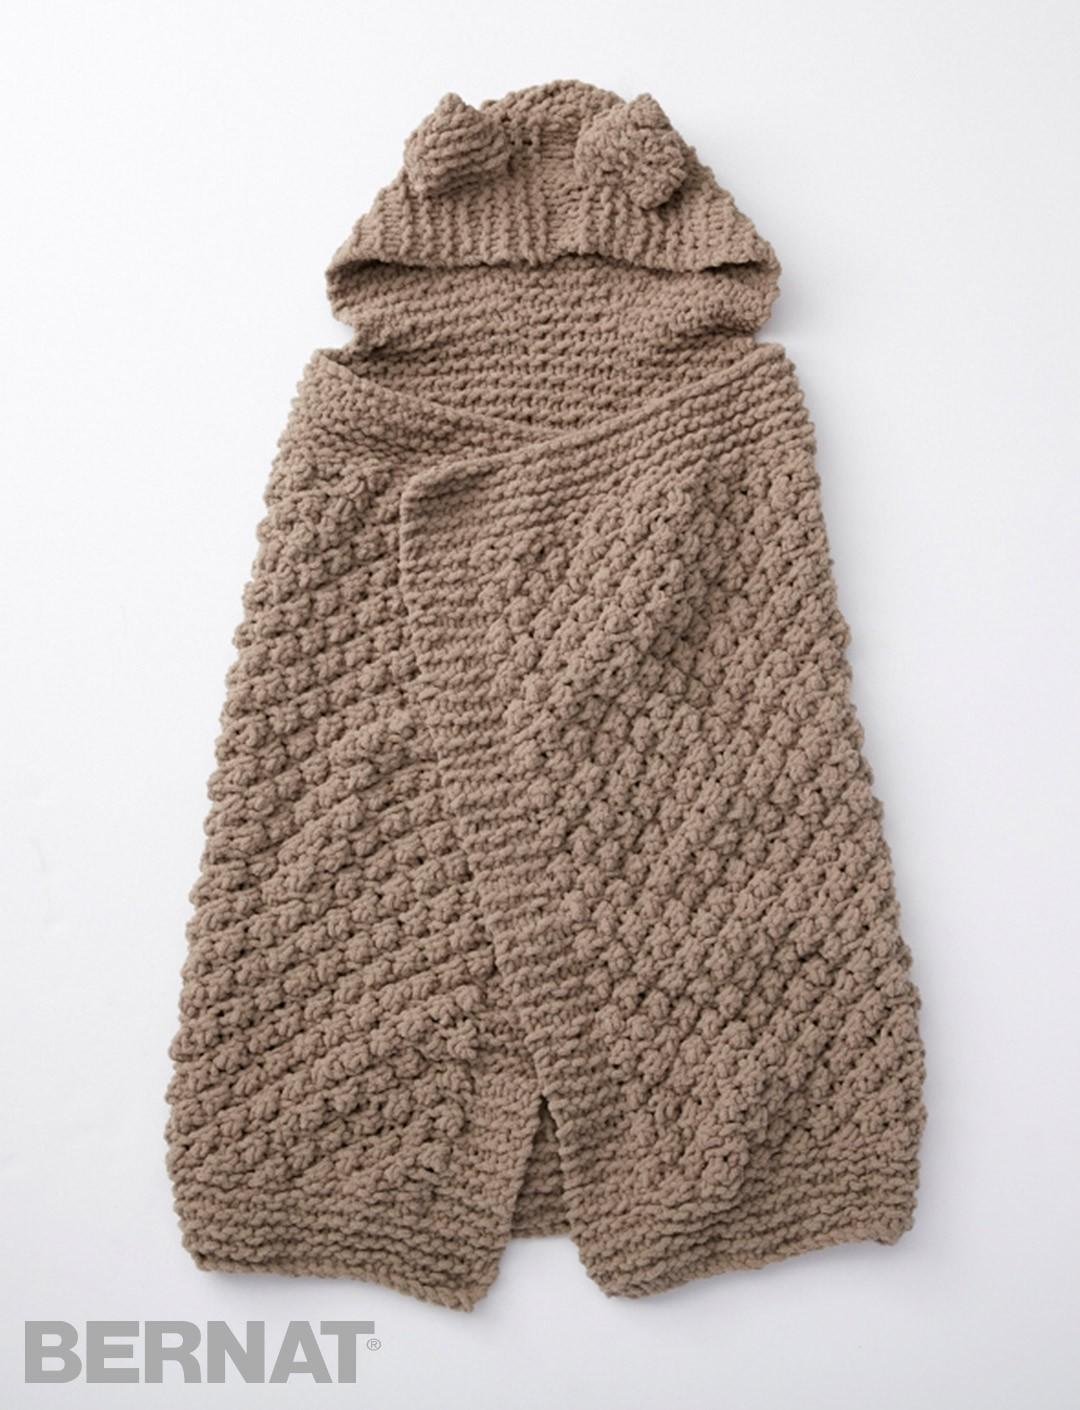 Baby Blanket Knitting Patterns squirreled away blanket mytdxnq